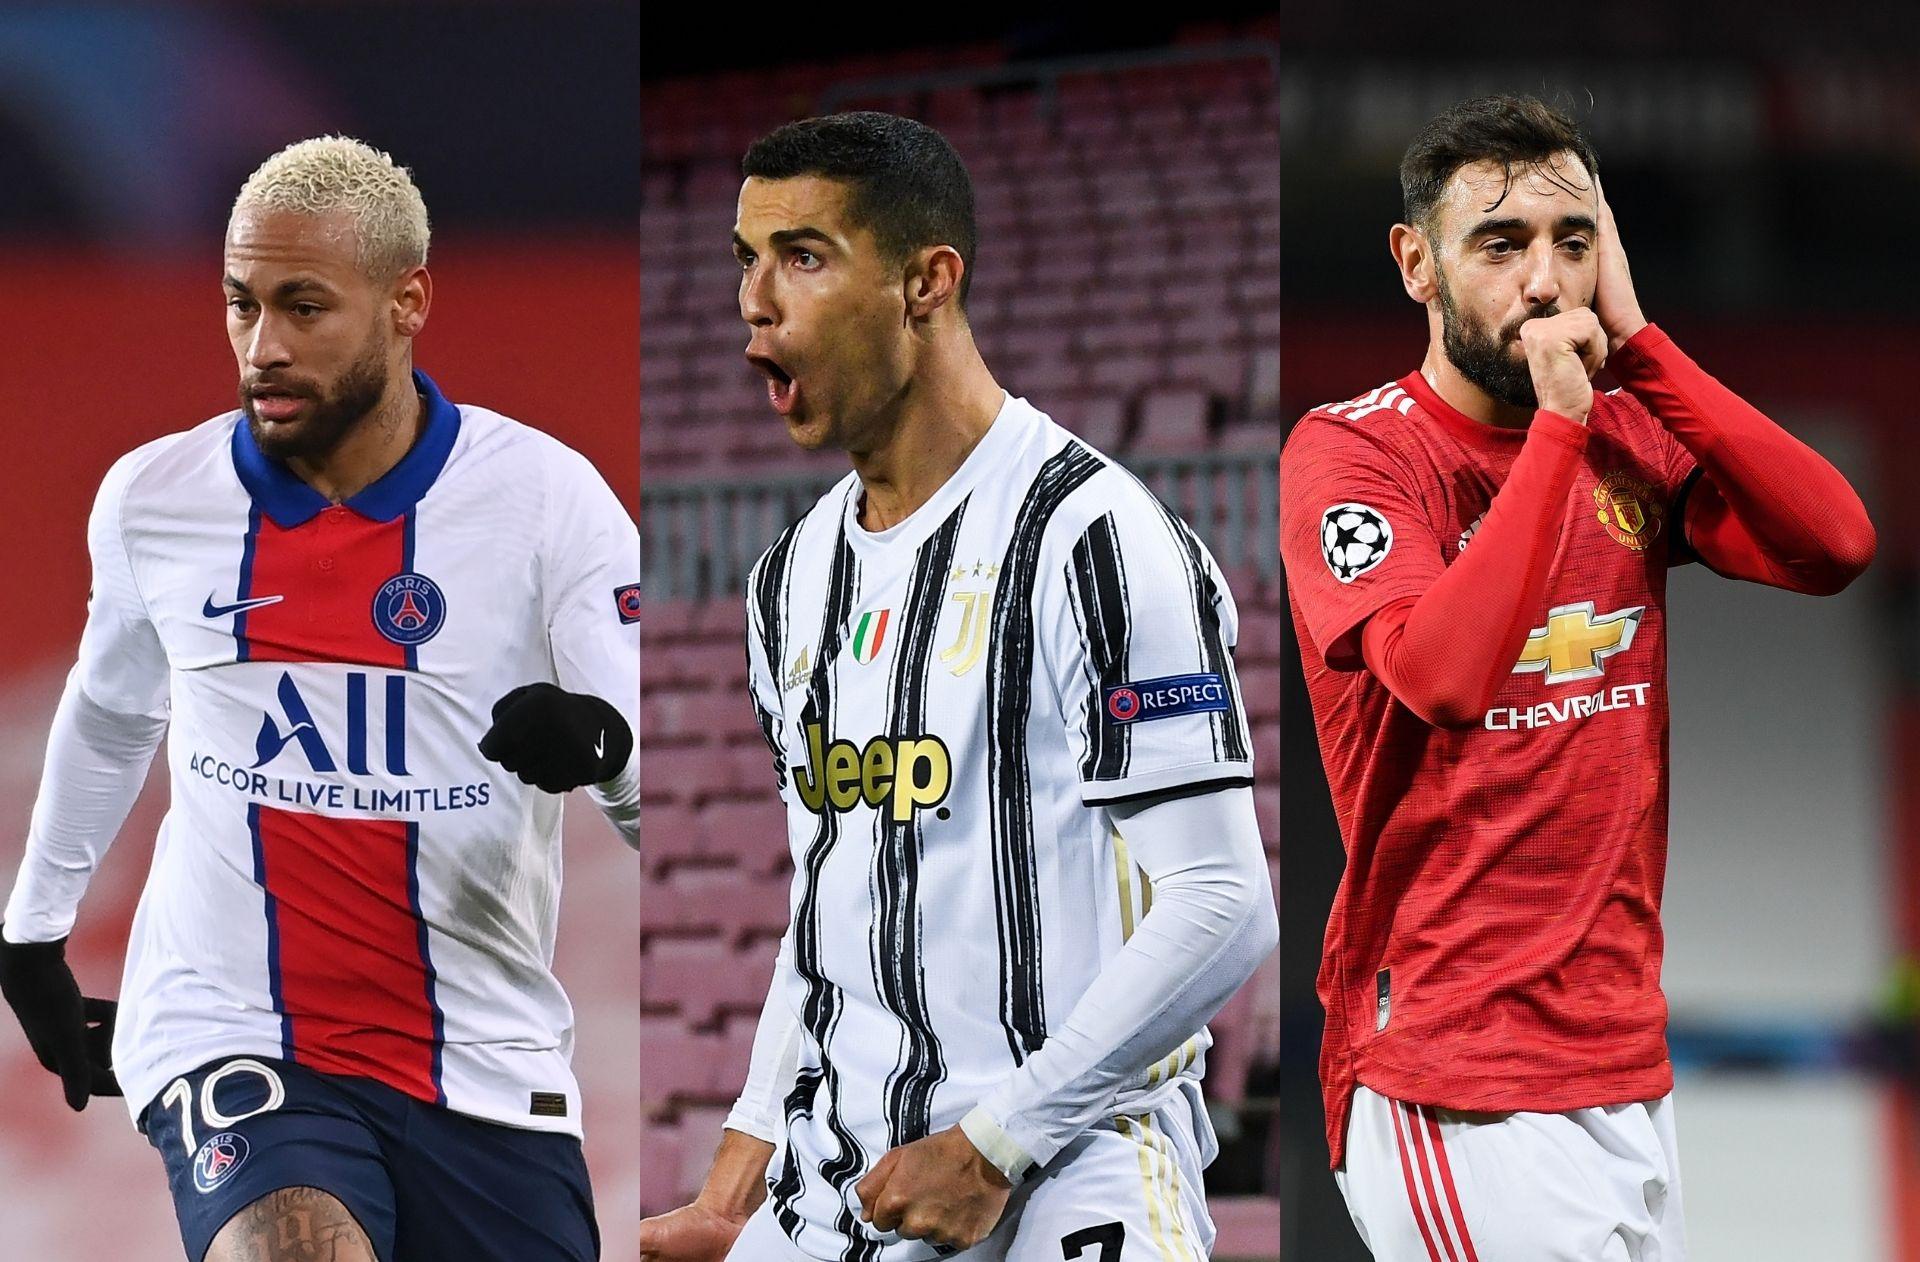 Neymar of Paris Saint-Germain, Cristiano Ronaldo of Juventus, Bruno Fernandes of Manchester United